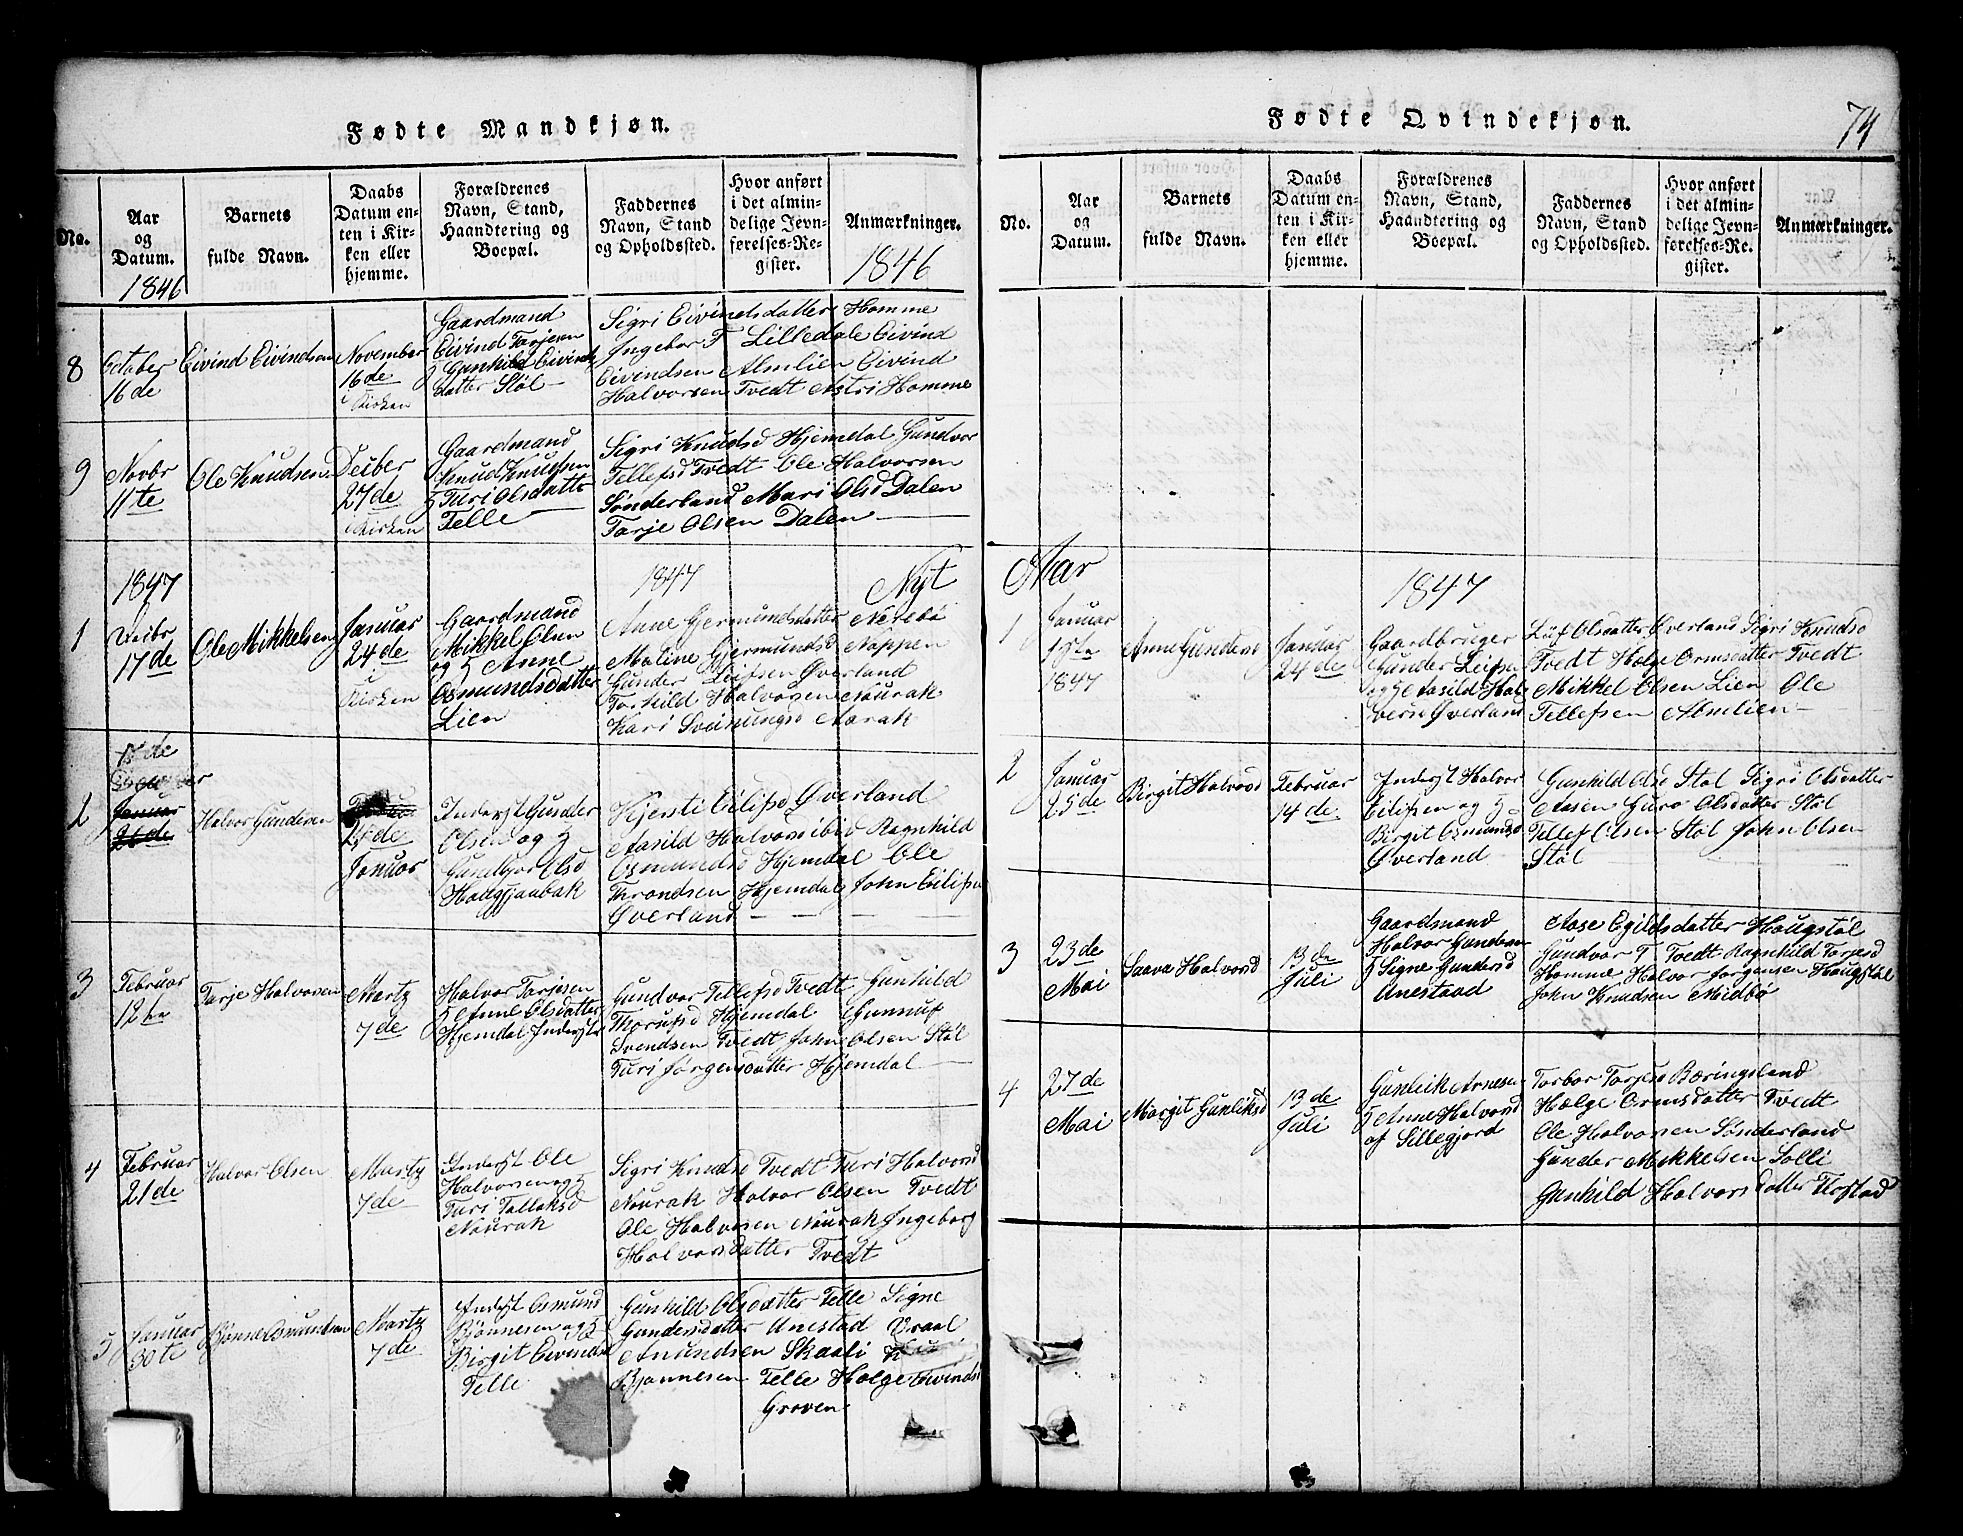 SAKO, Nissedal kirkebøker, G/Gb/L0001: Klokkerbok nr. II 1, 1814-1862, s. 74